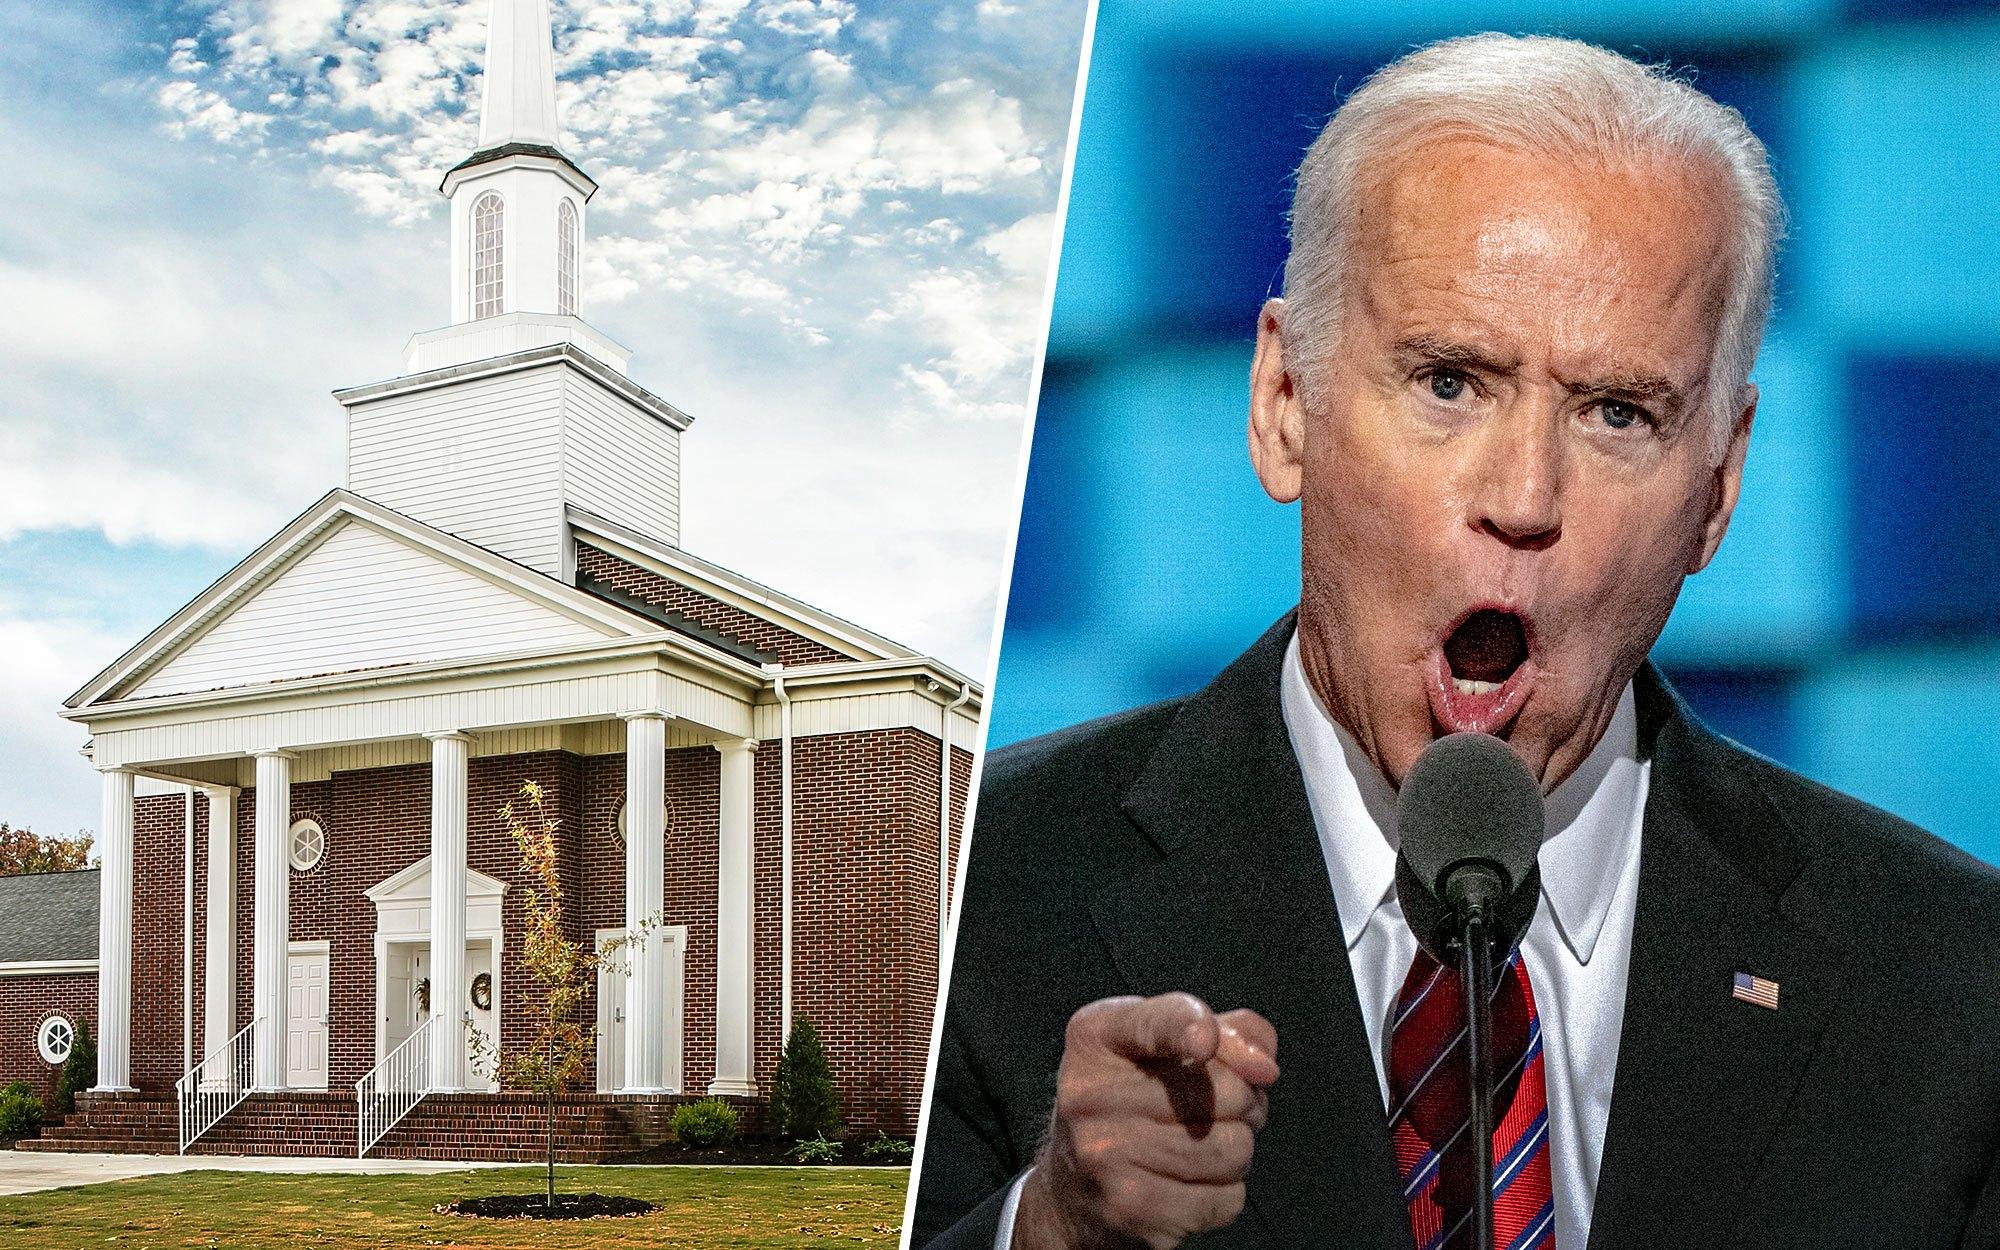 Biden Preaches to Black Church, Compares Trump to KKK Once Again